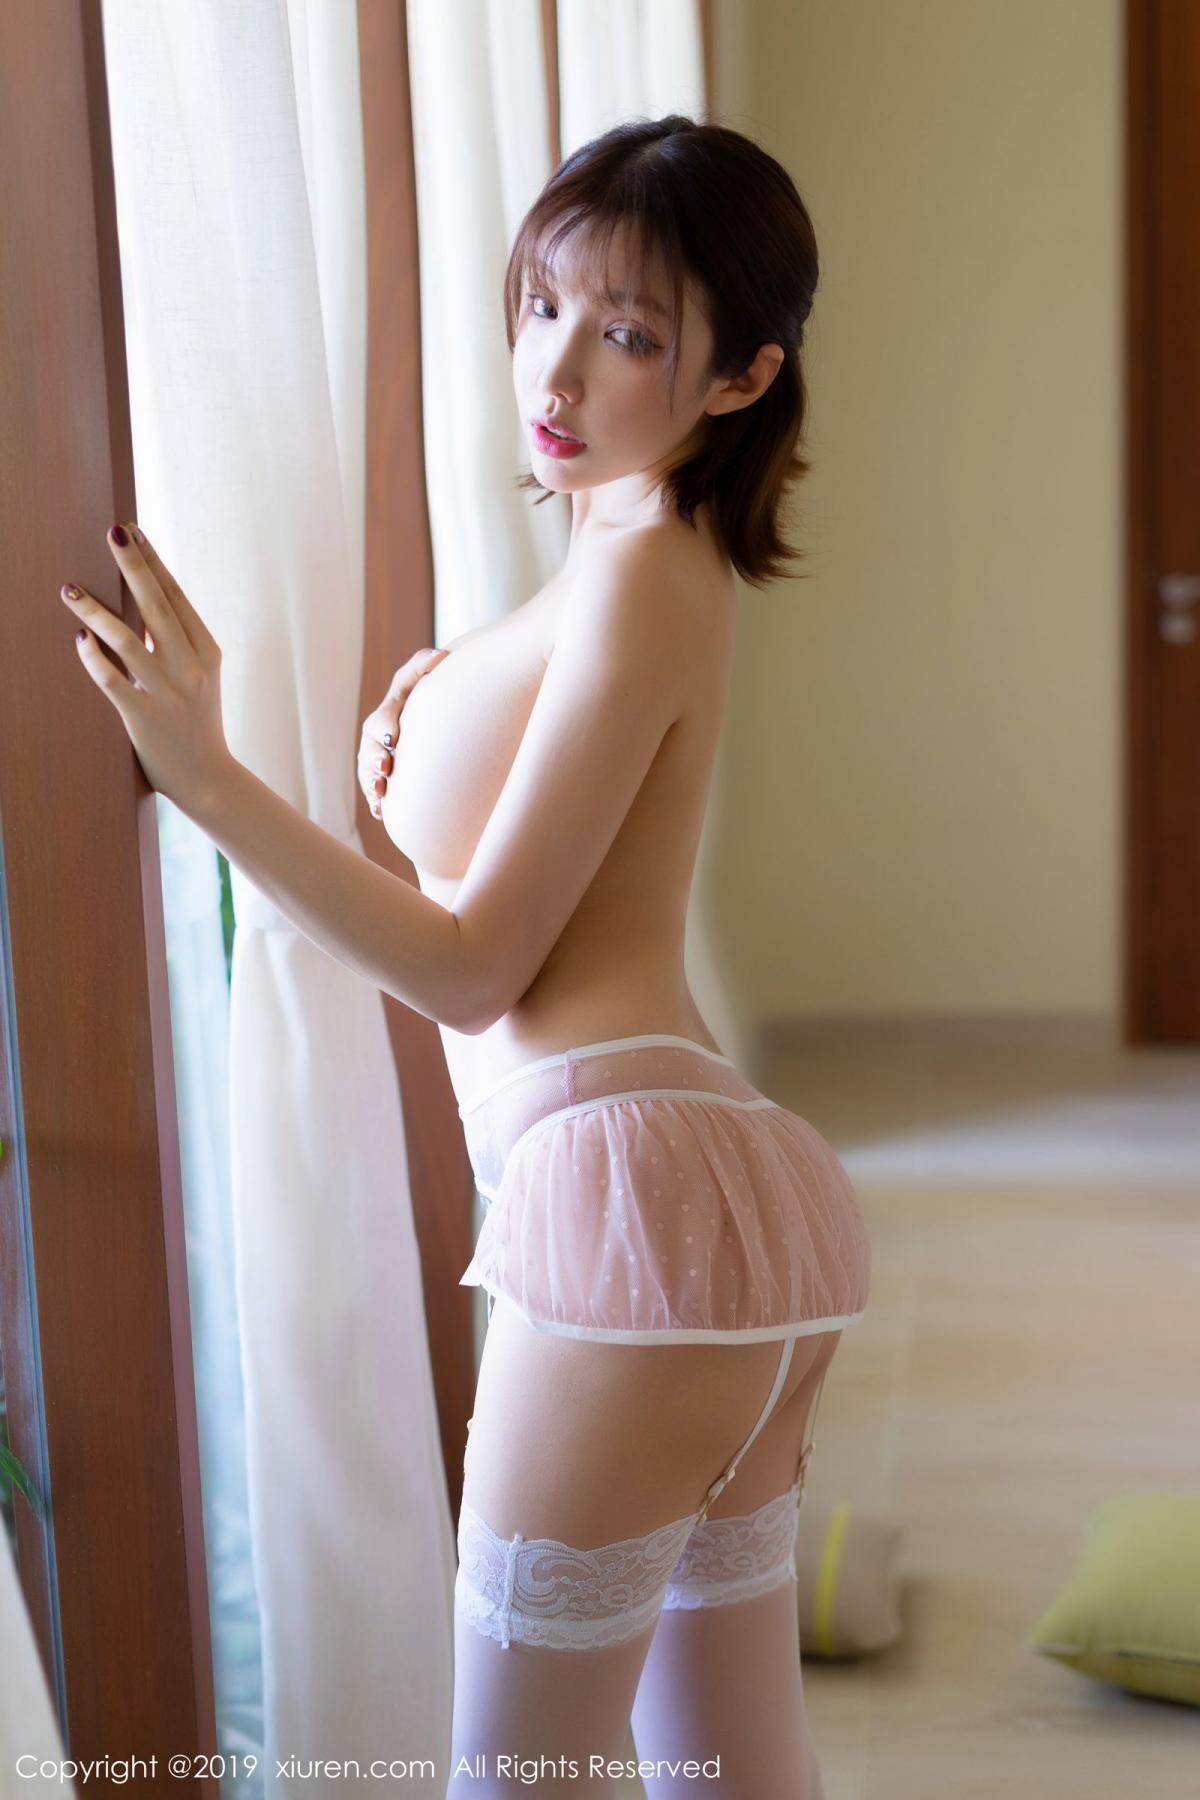 [XiuRen] Vol.1671 Huang Le Ran 40P, Adult, Huang Le Ran, Underwear, Xiuren